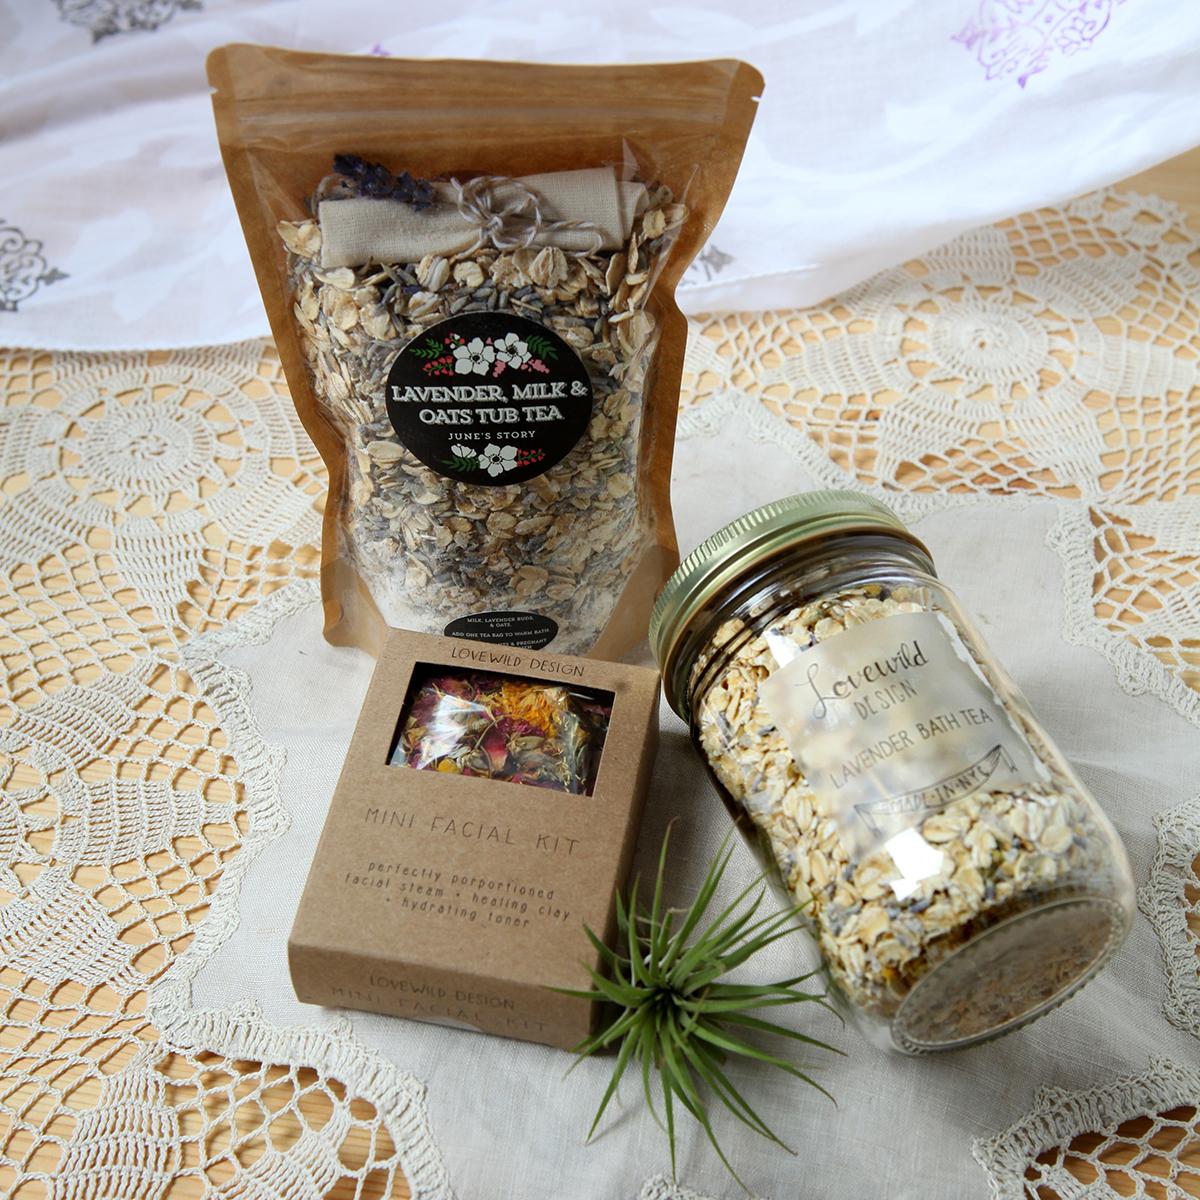 Mini facial kit $16, Lavender bath tea $10, Lavender milk and oat tub tea $15.